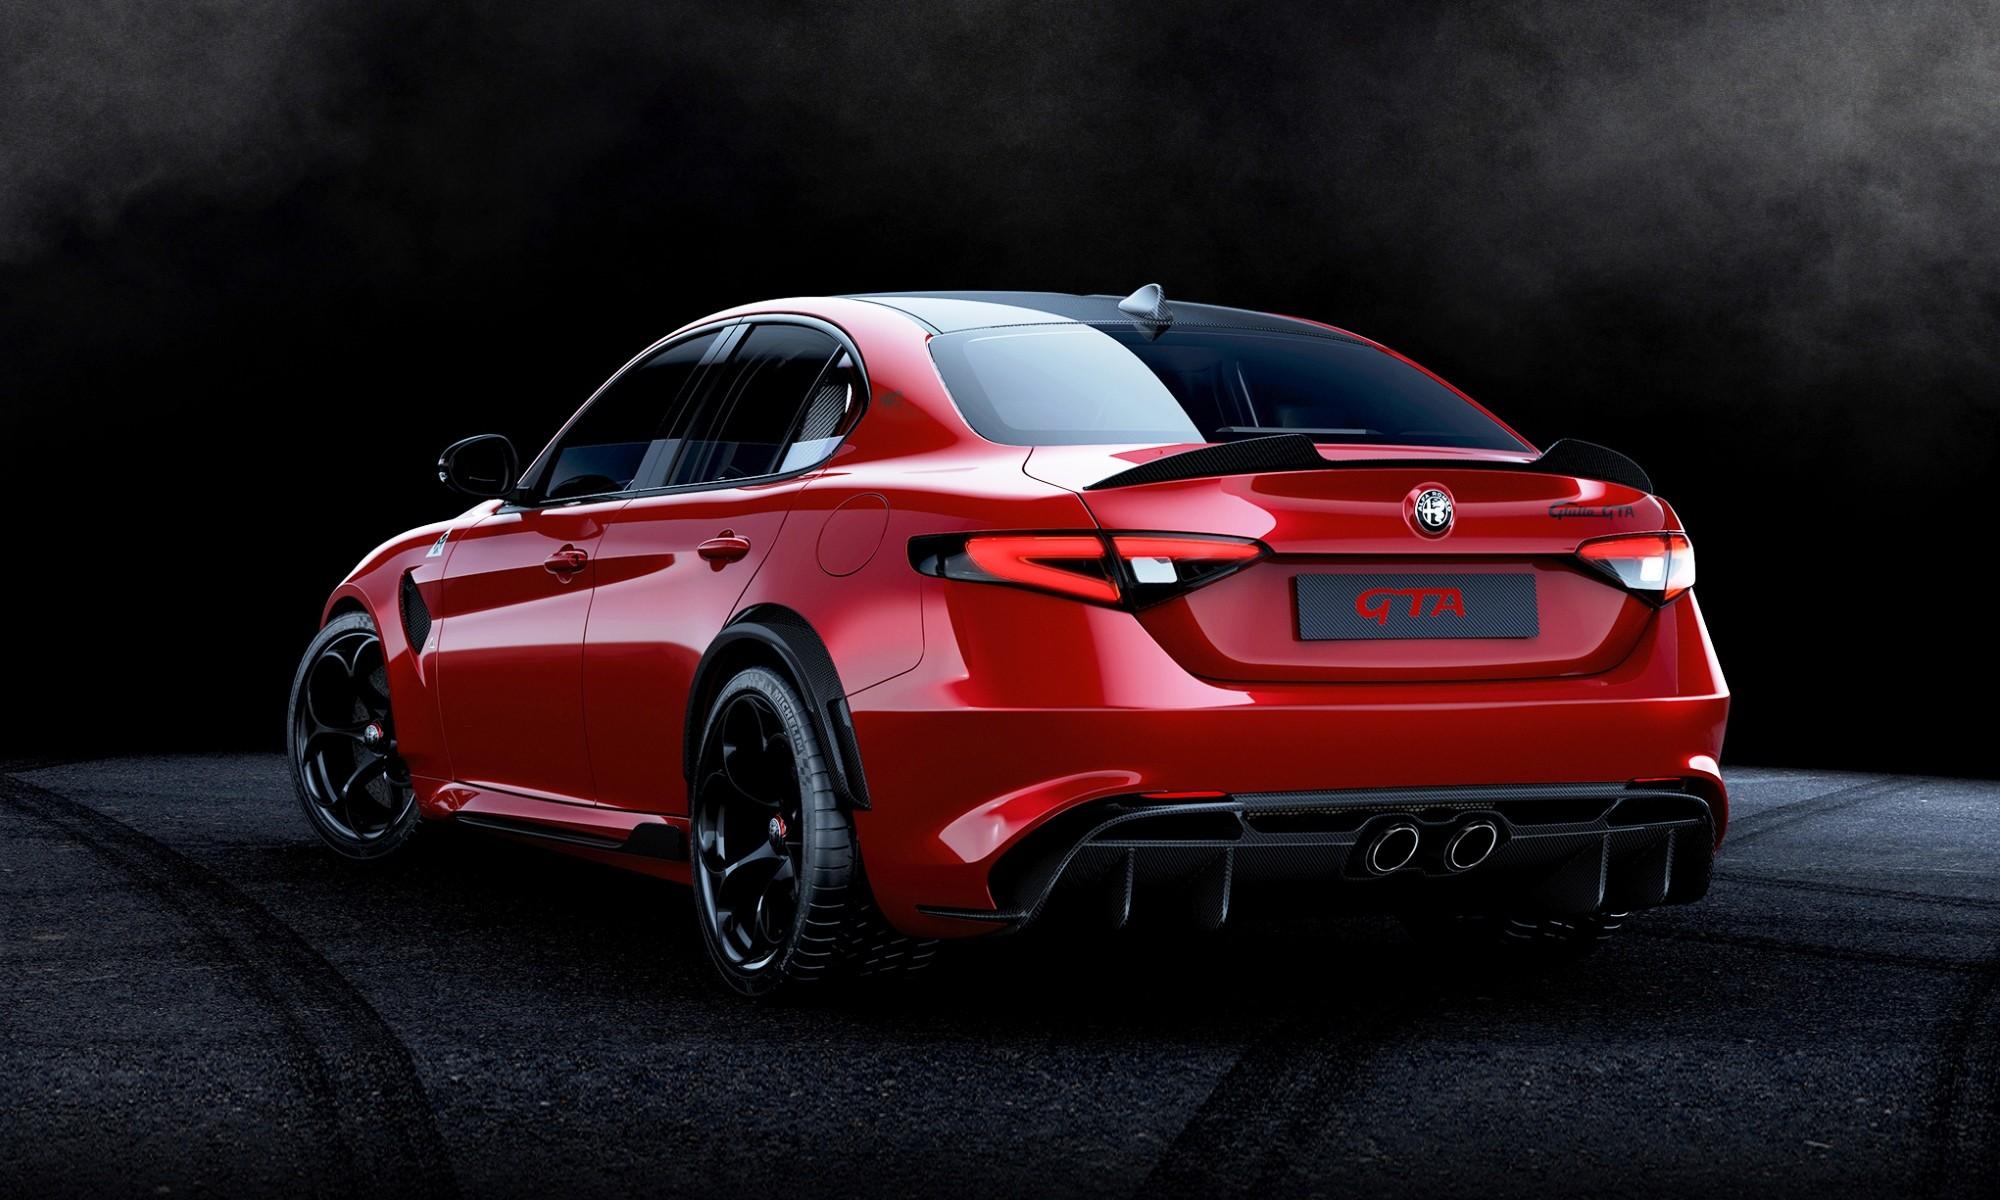 Alfa Romeo Giulia GTA and GTAm are new high-performance ...